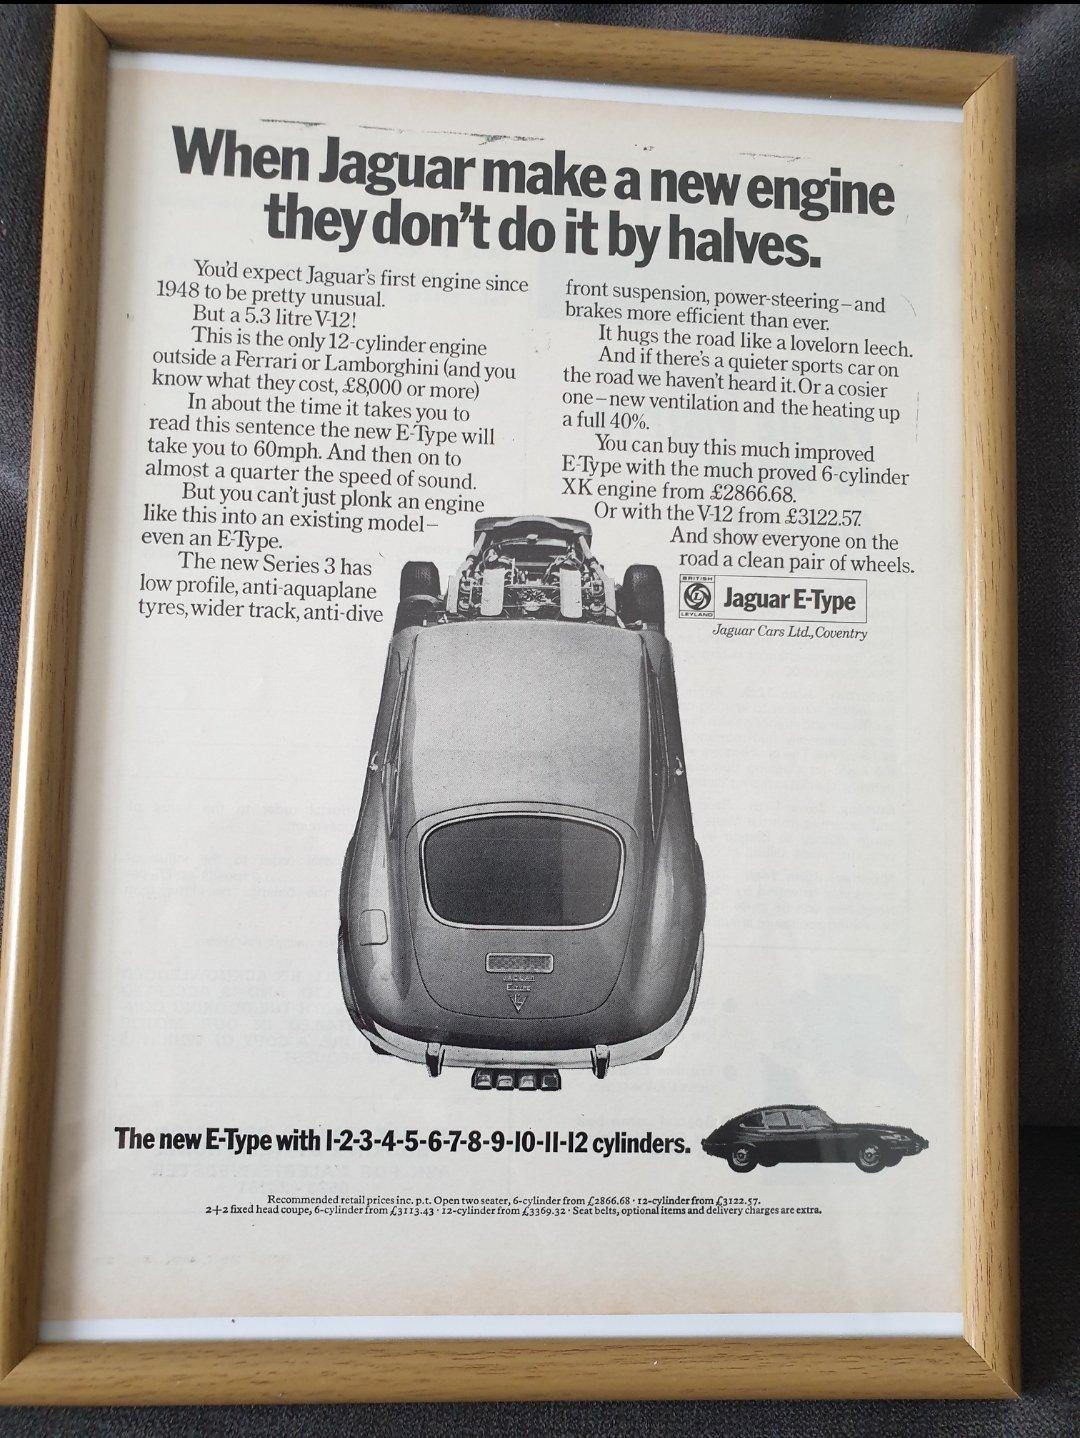 1971 Jaguar E-type advert Original  For Sale (picture 1 of 2)